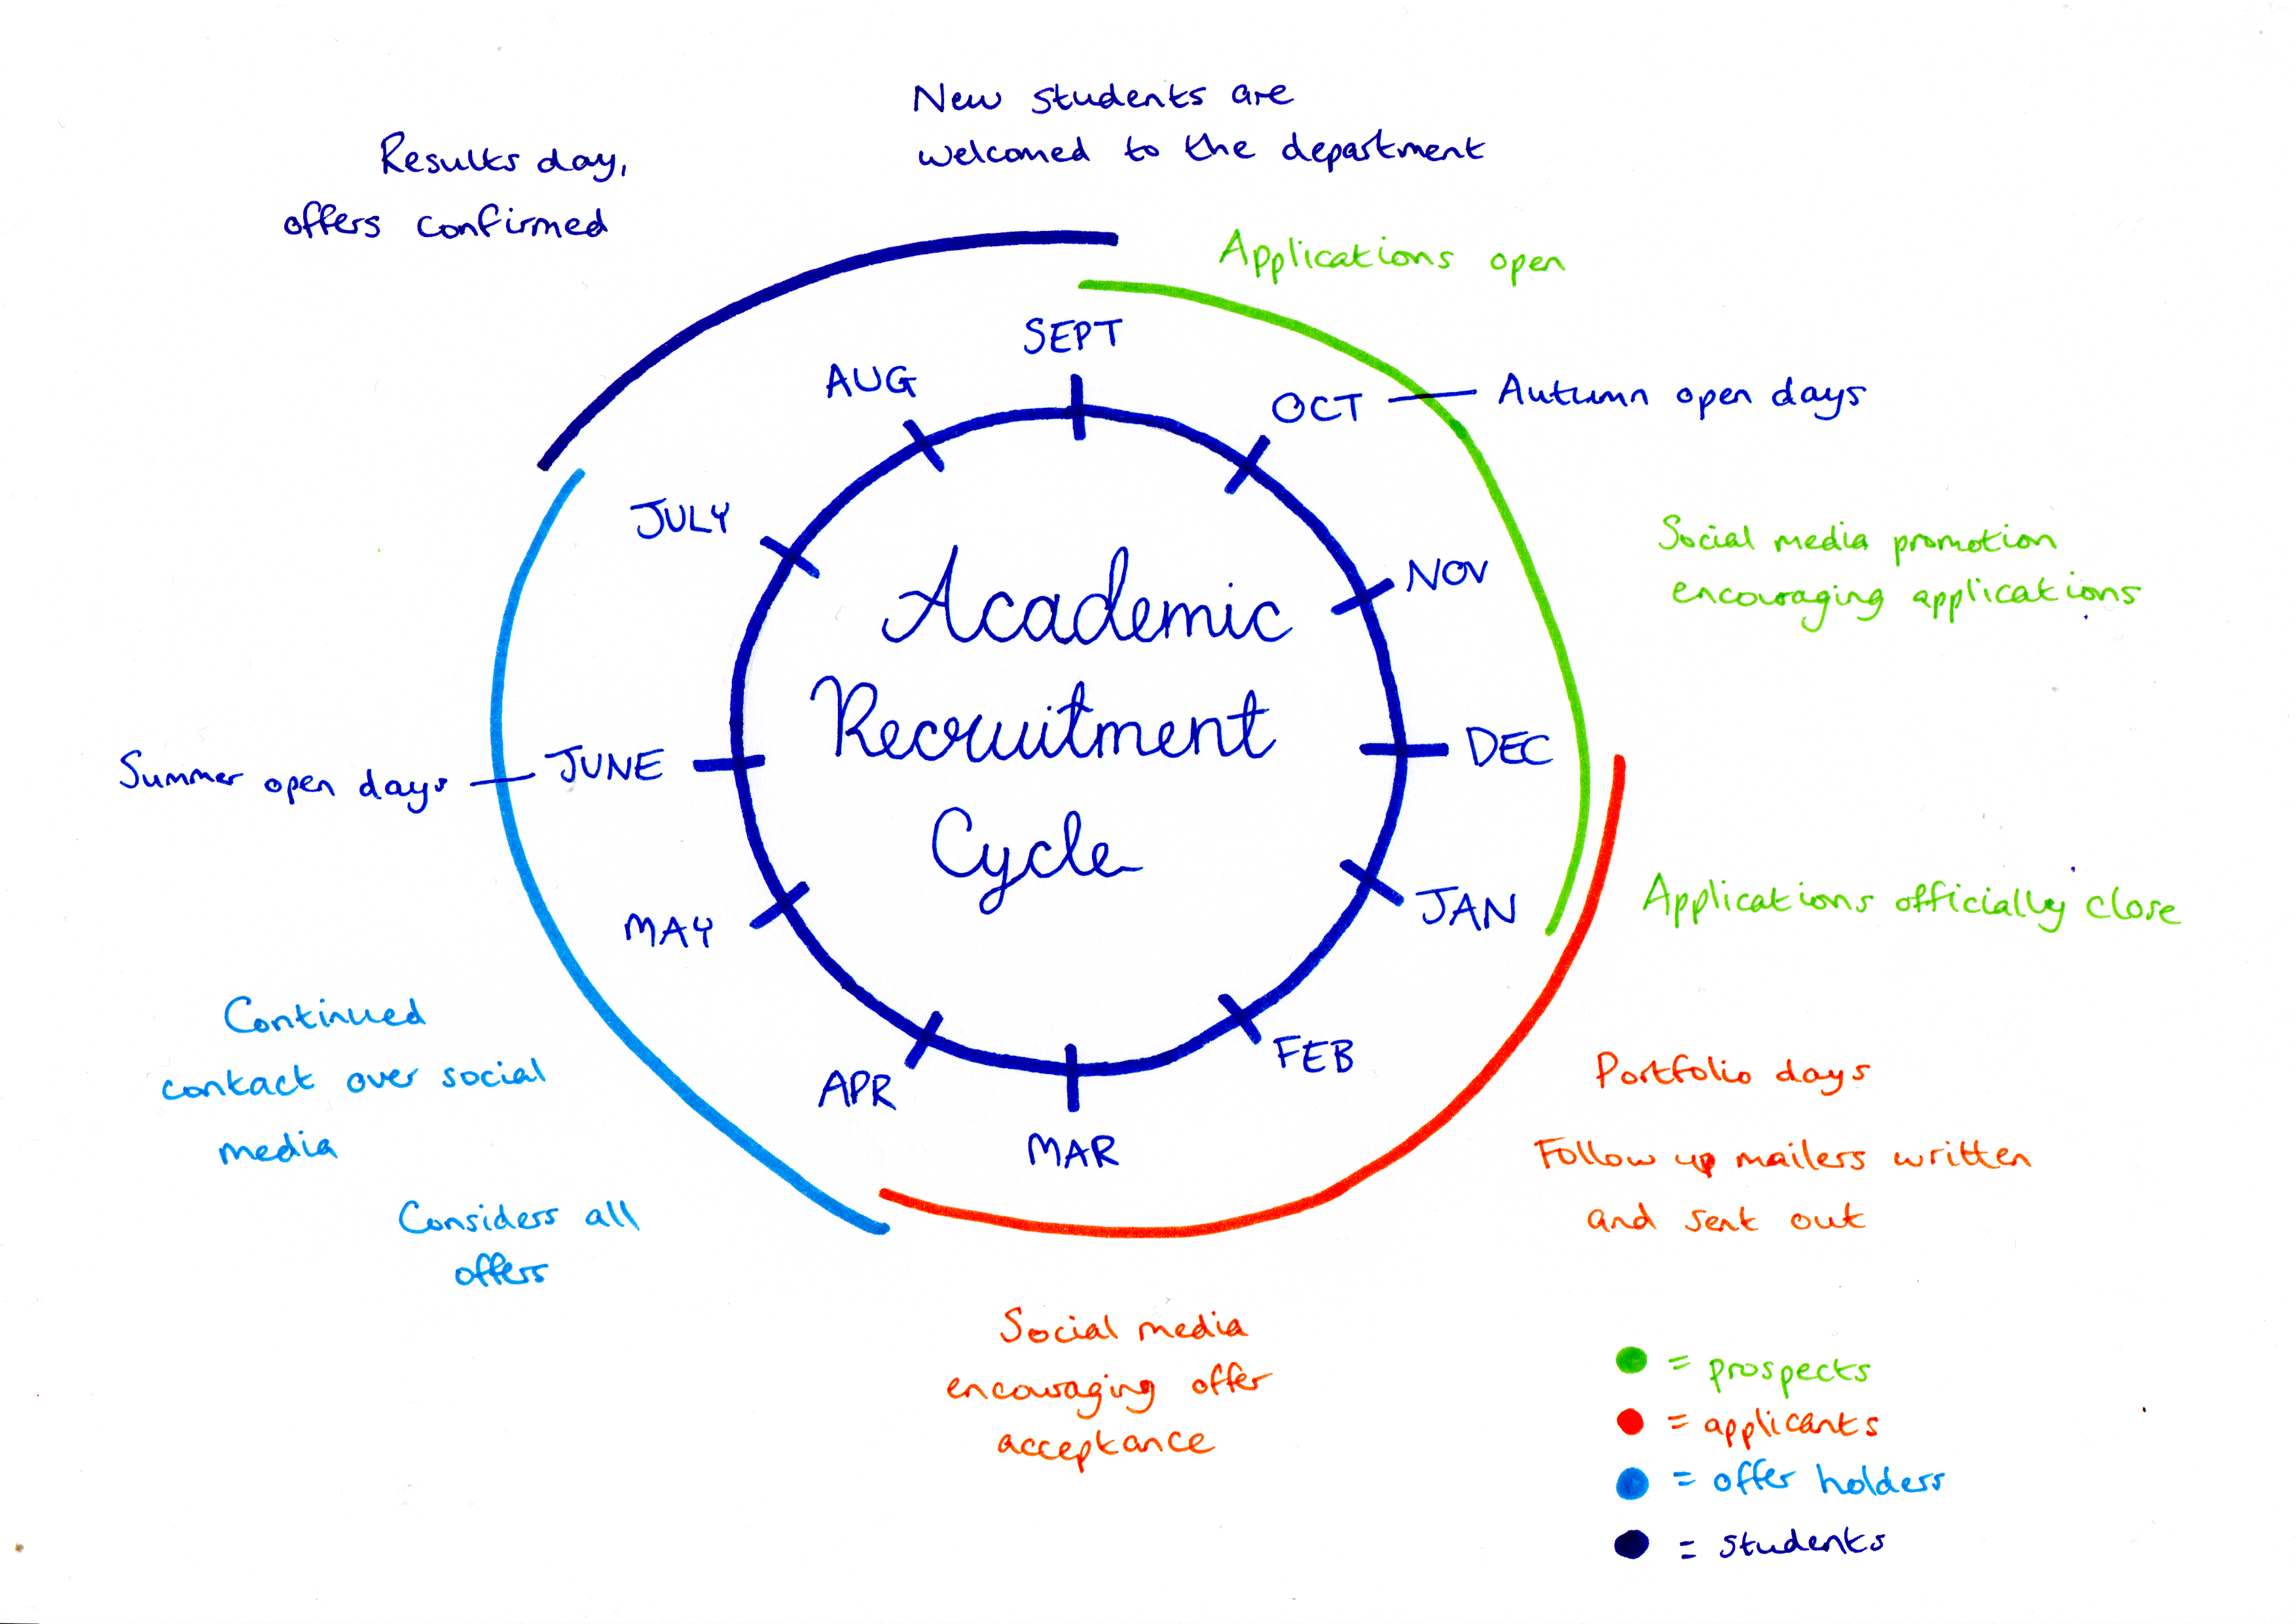 Academic Recruitment cycle diagram